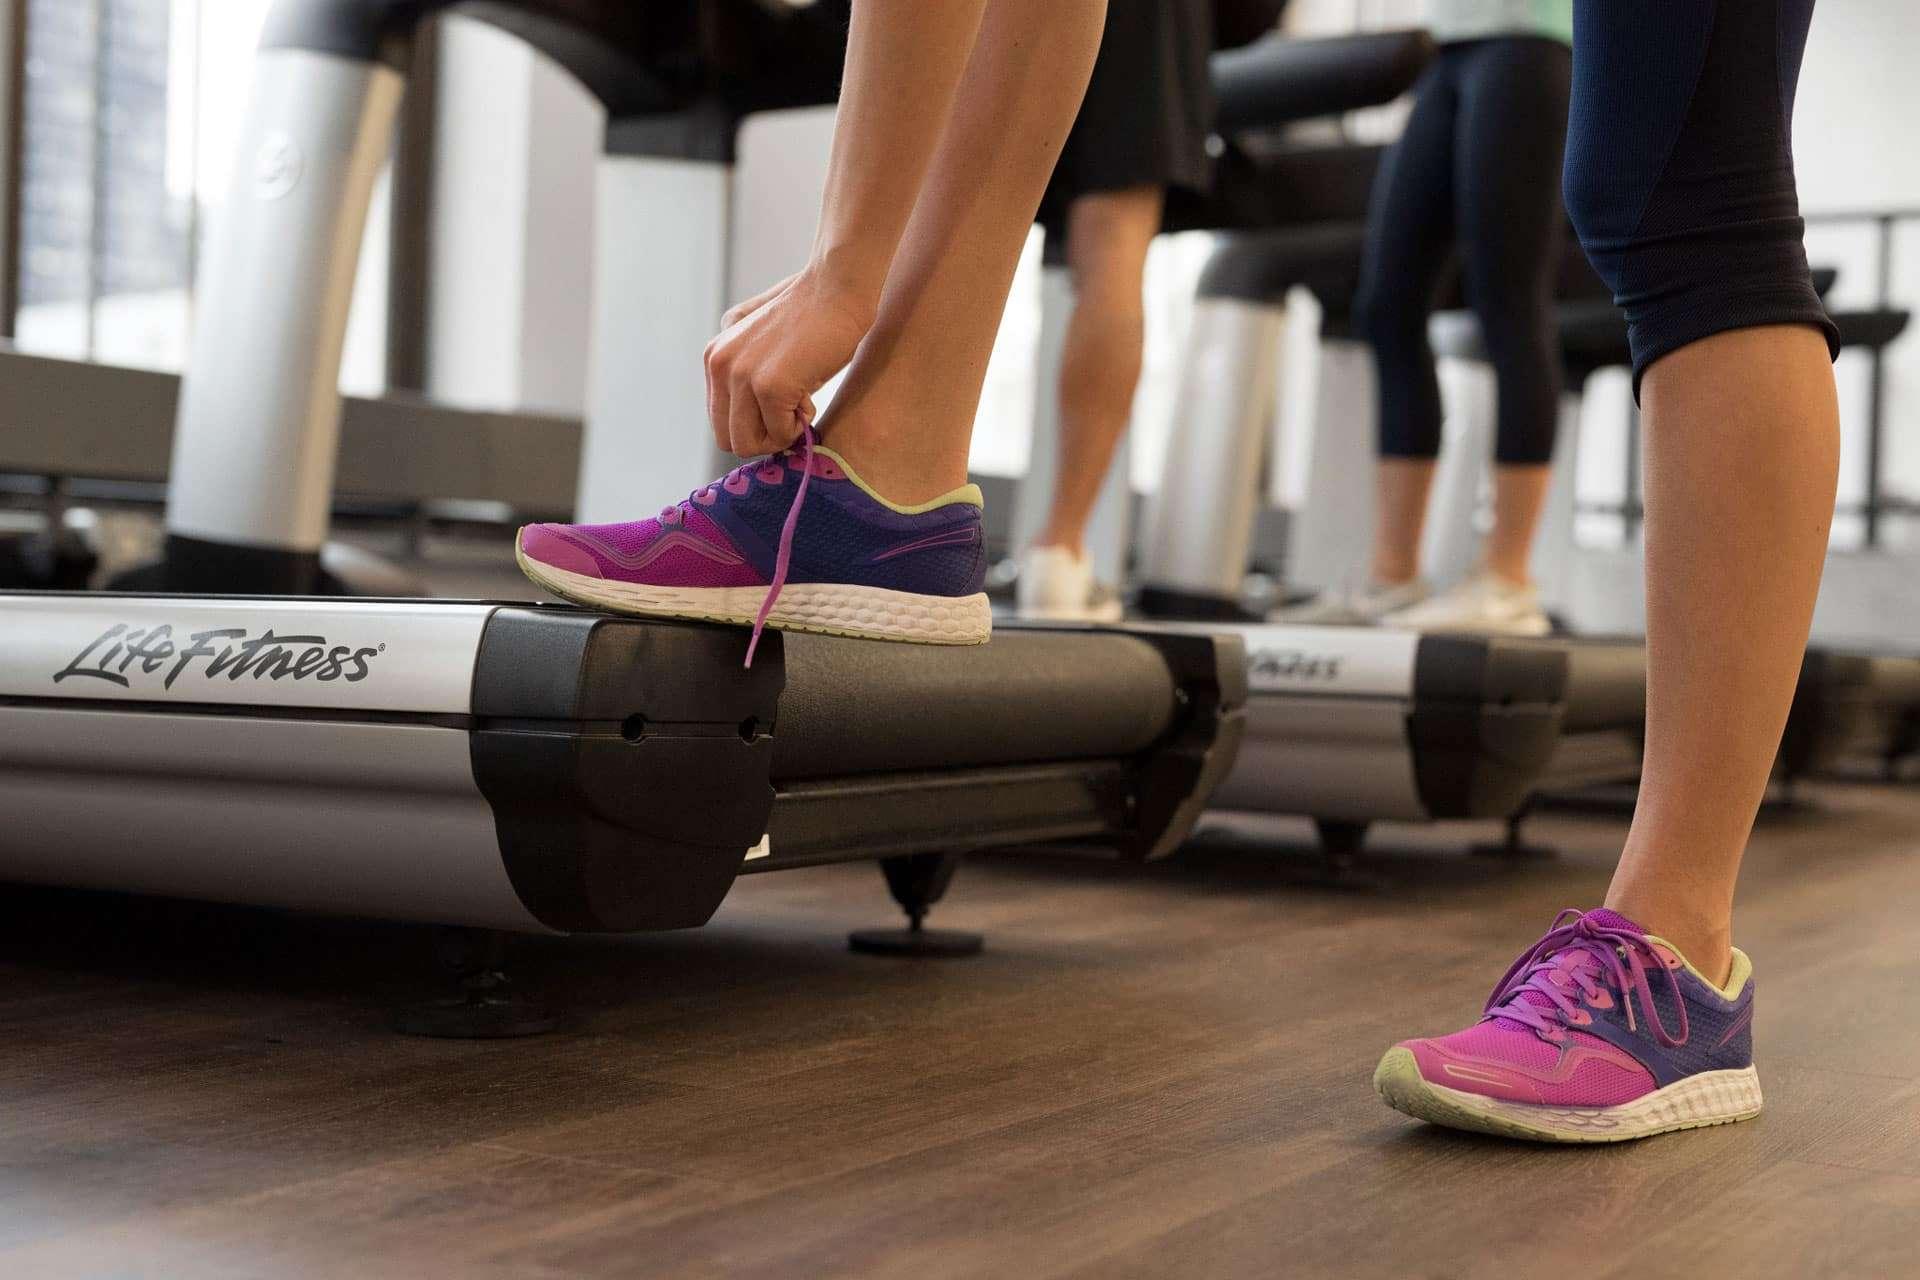 Virtuagym Announces Partnership with Life Fitness